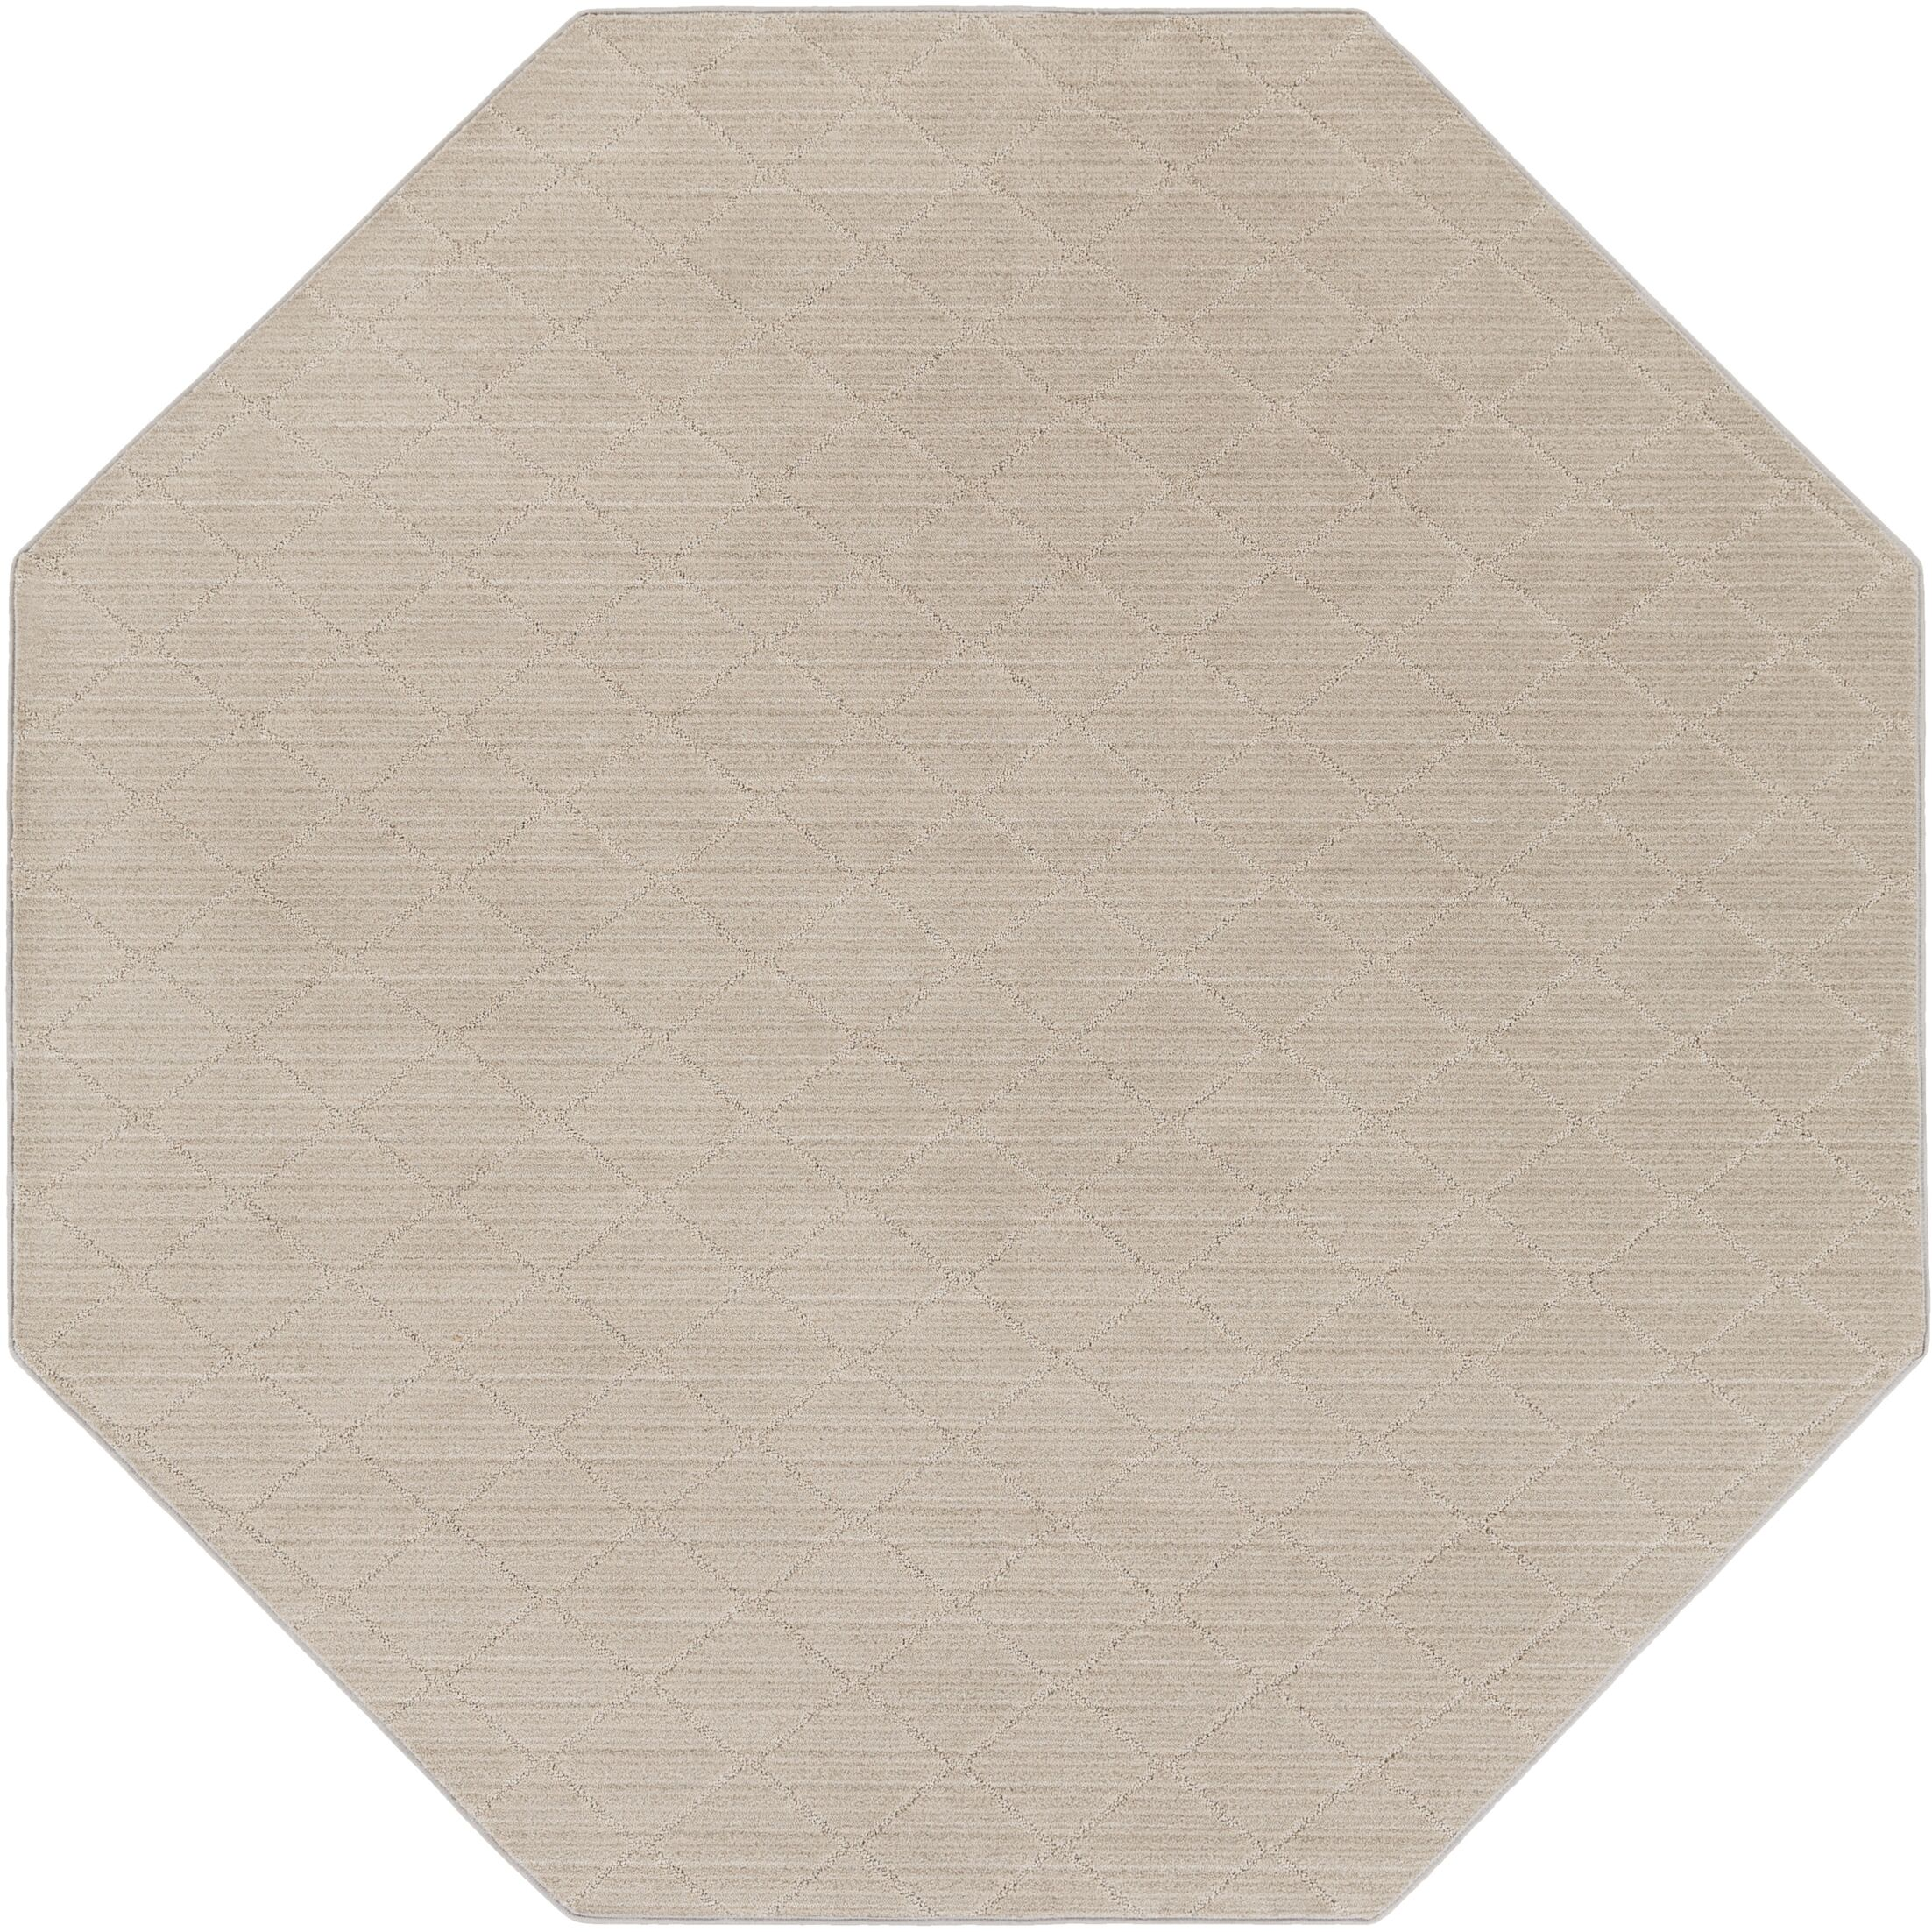 Huxley Gray Area Rug Rug Size: Octagon 4'